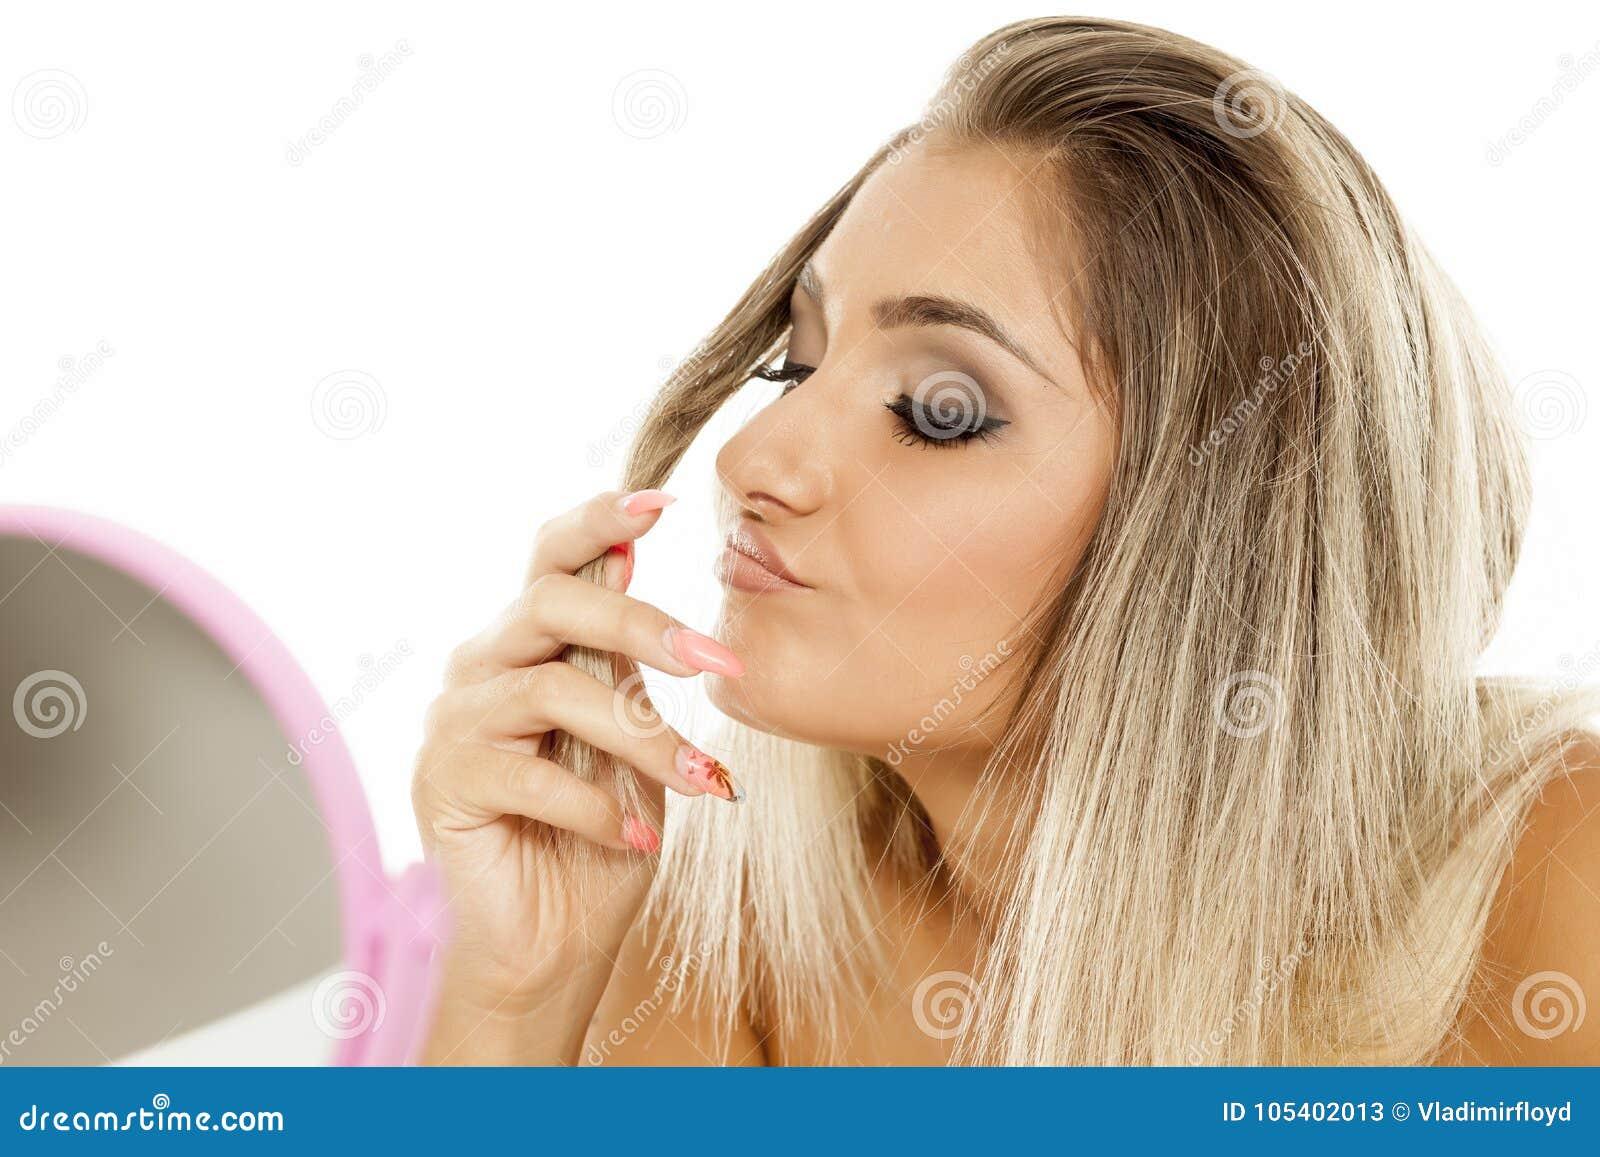 Hair smell